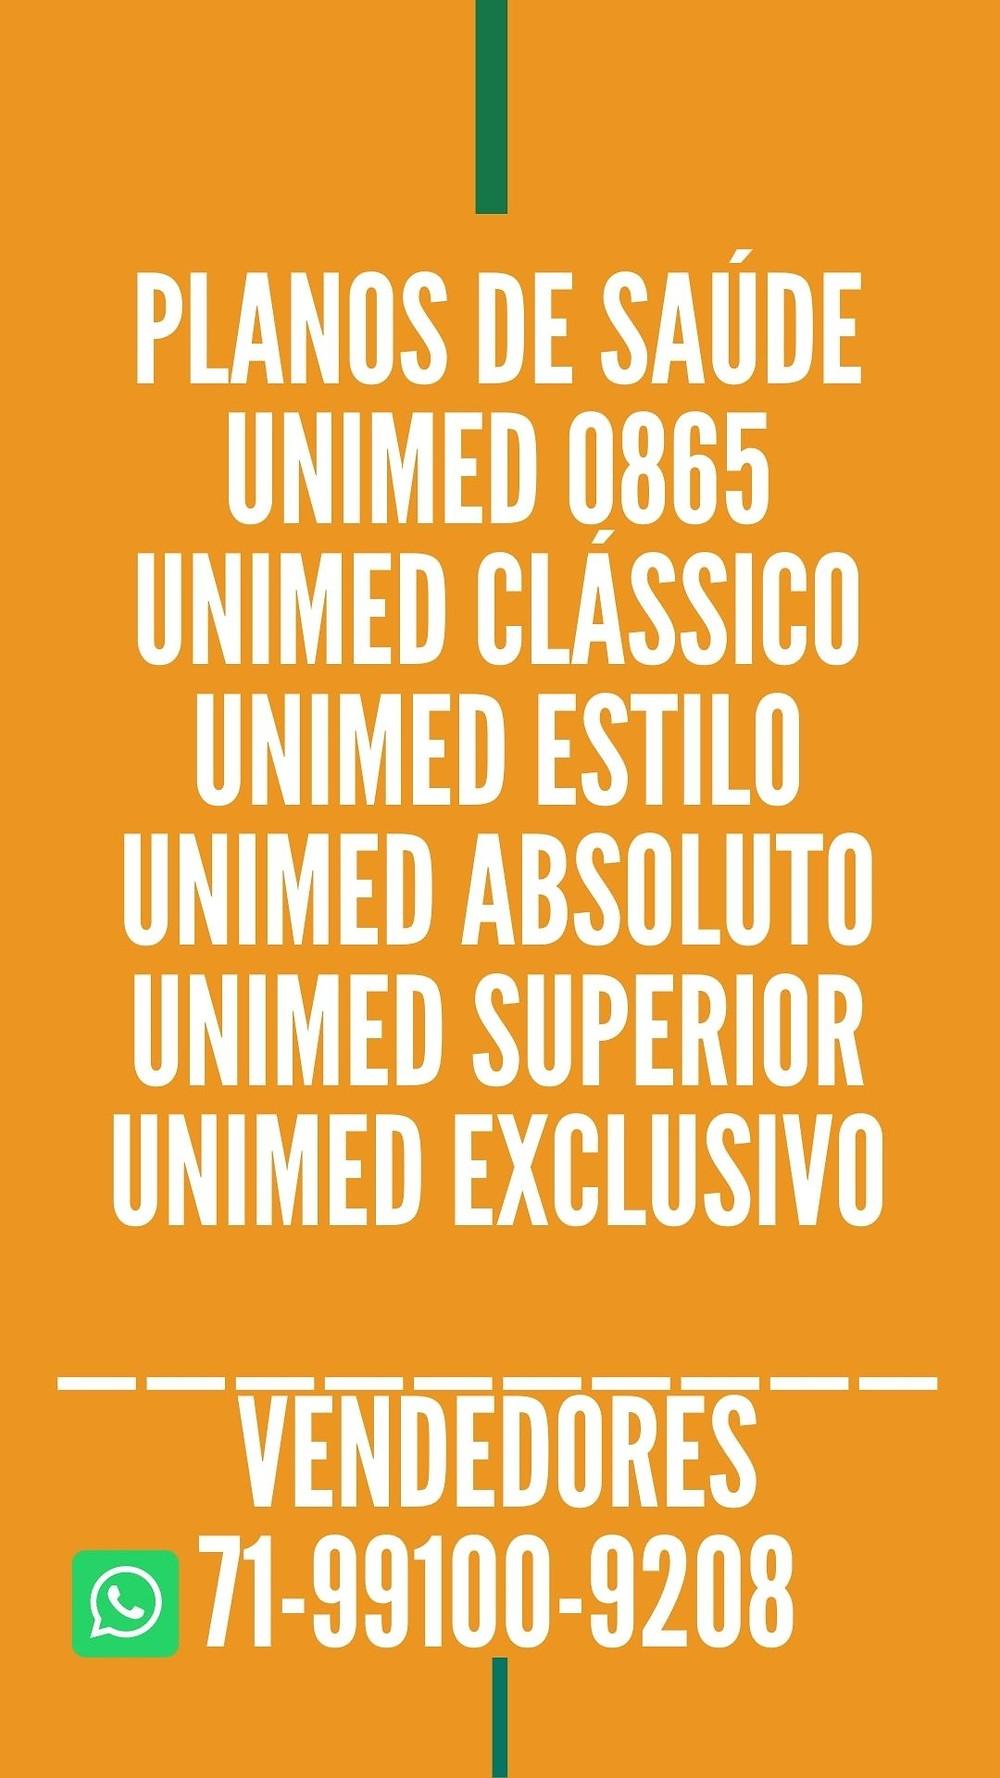 Unimed Classico | Estilo | Absoluto | Superior